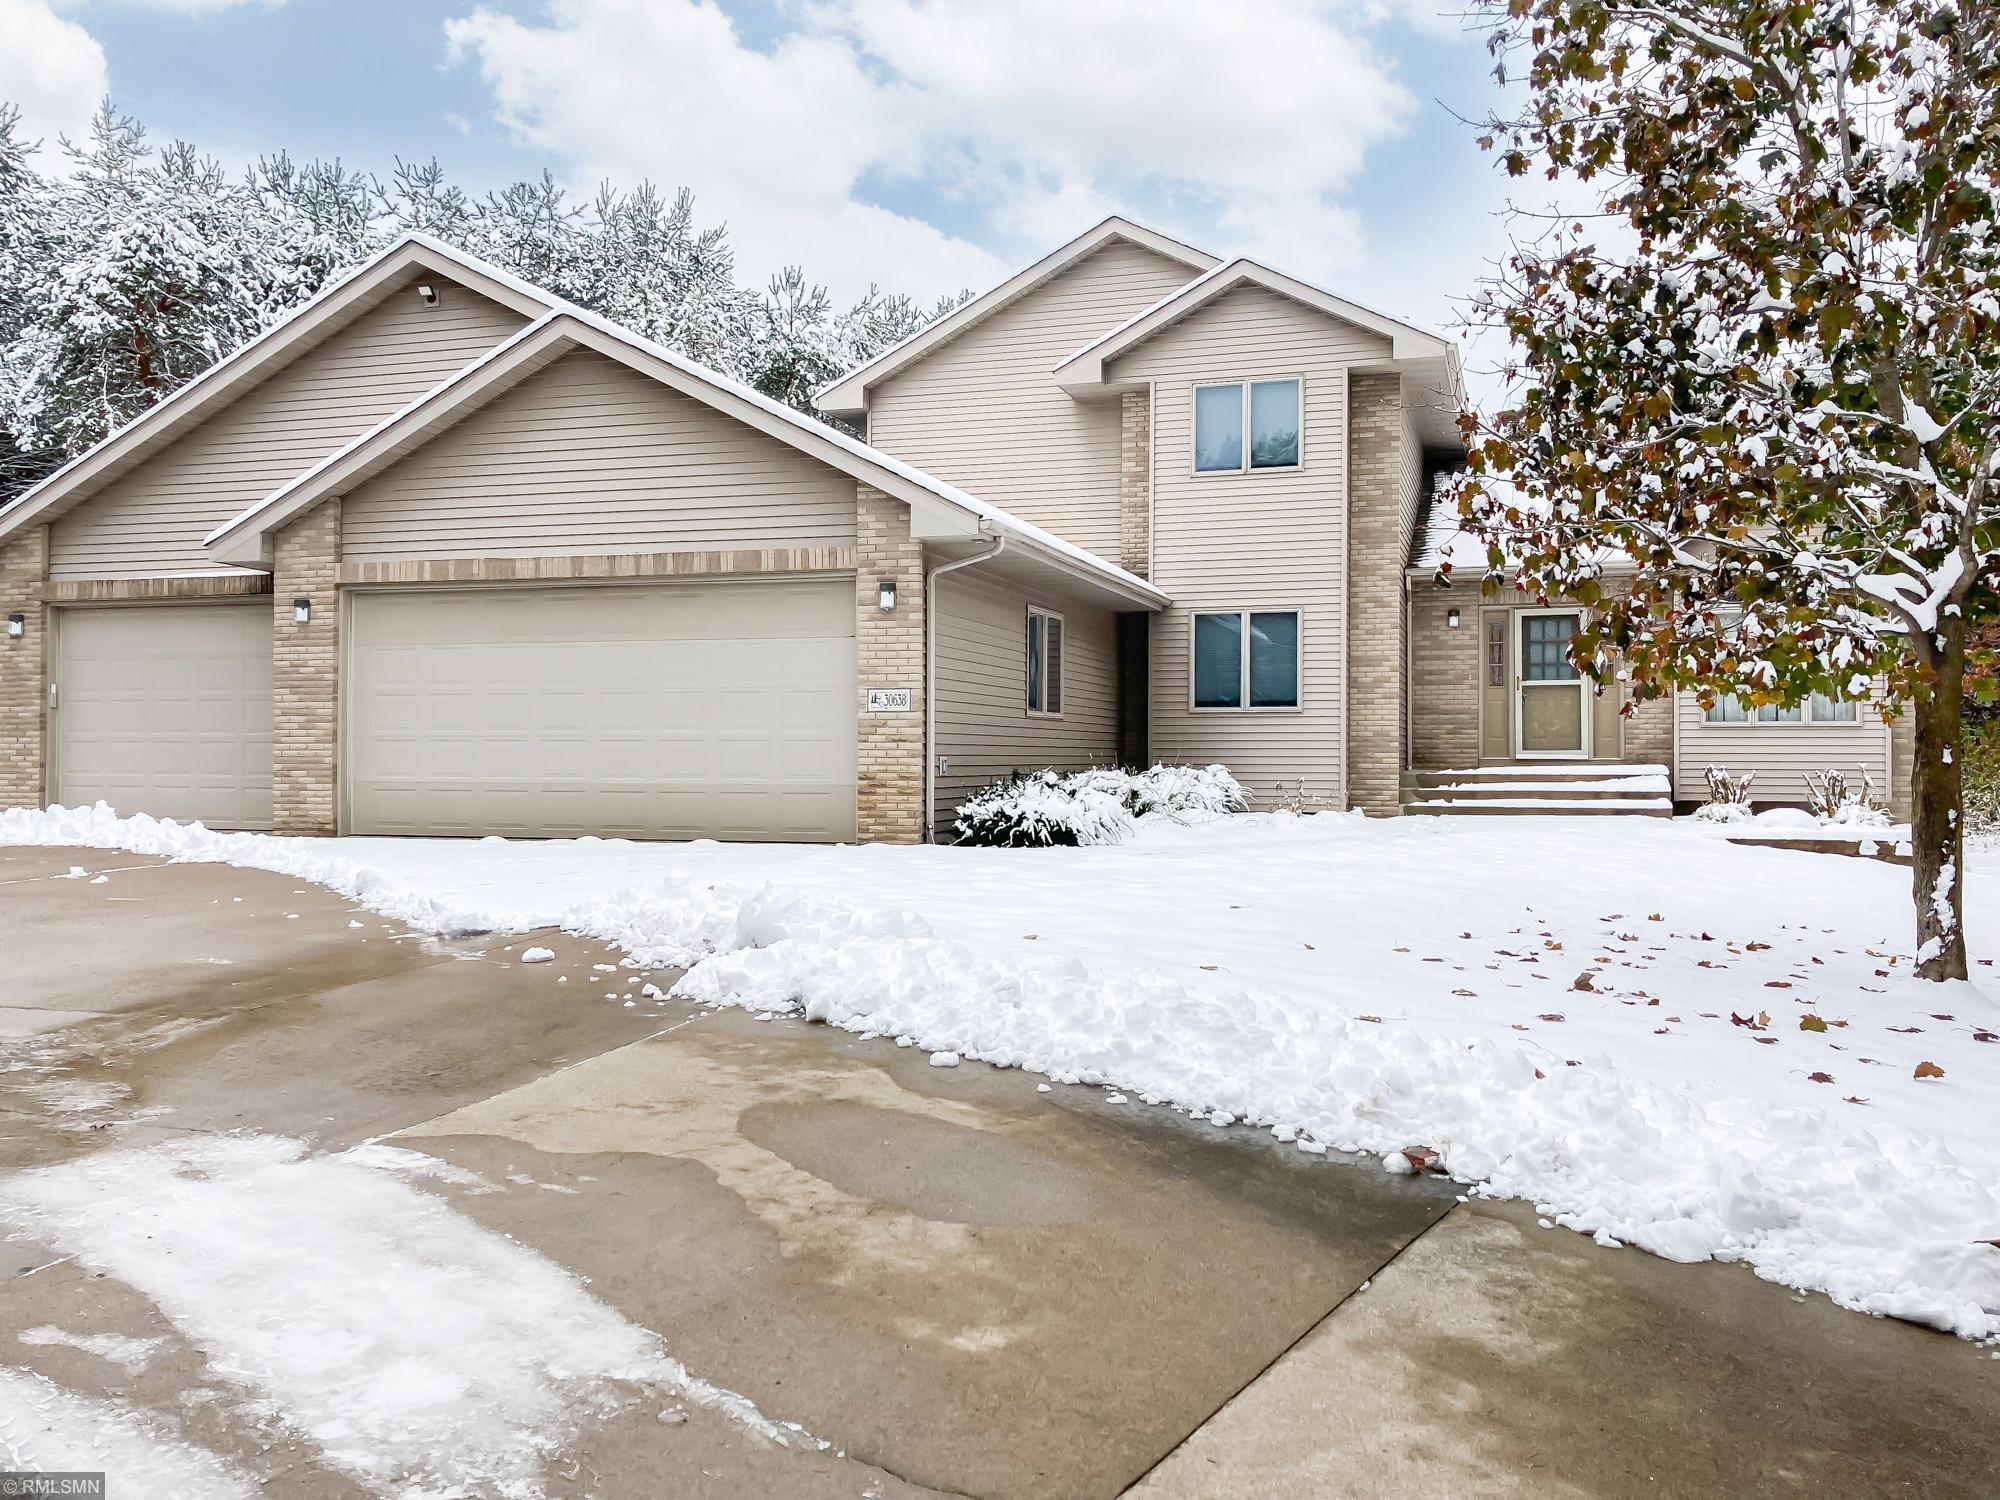 30638 108th Street Property Photo - Princeton, MN real estate listing